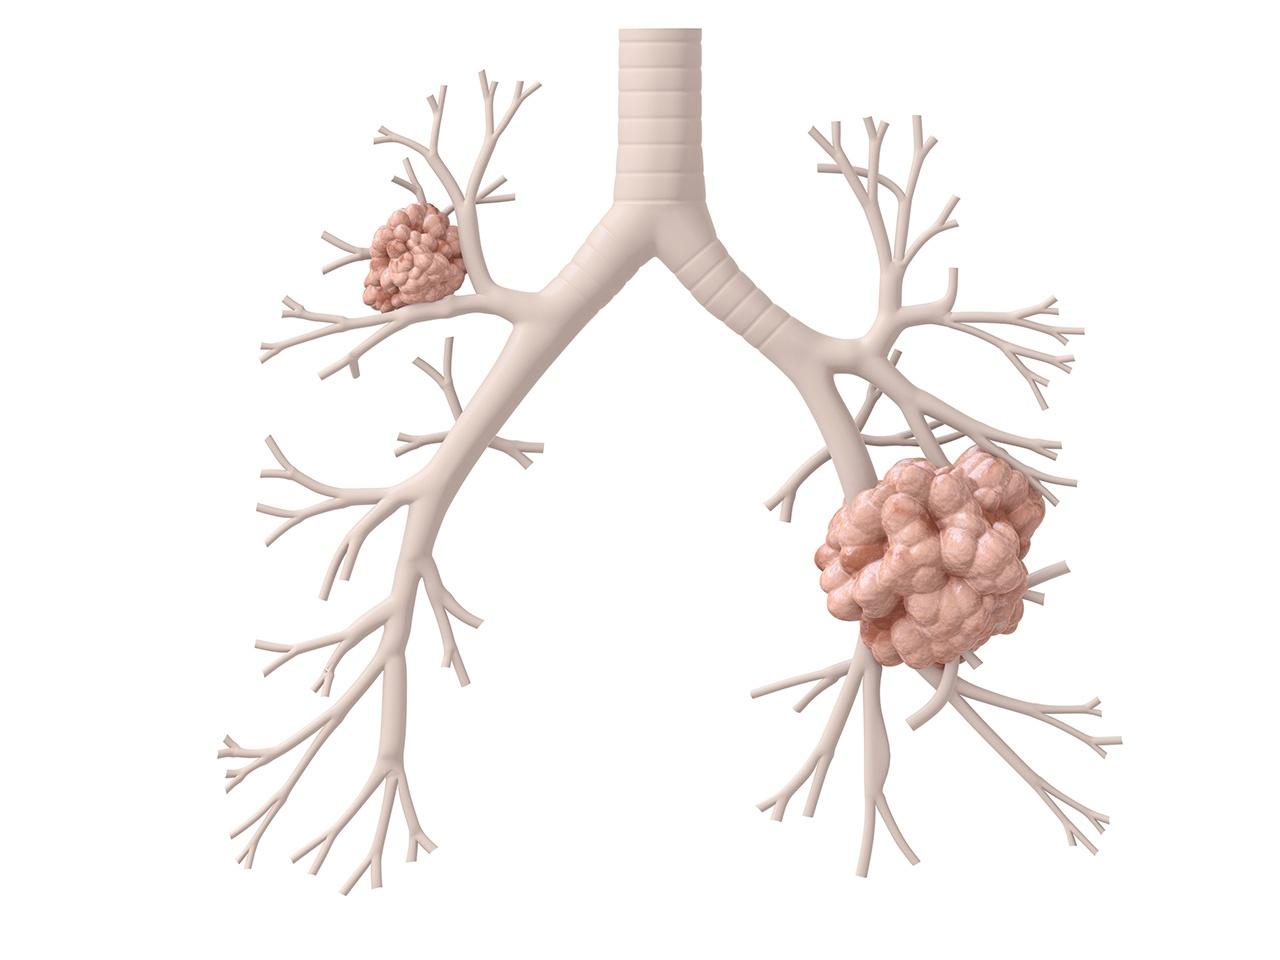 pulmon-interno-oncosalud.jpg